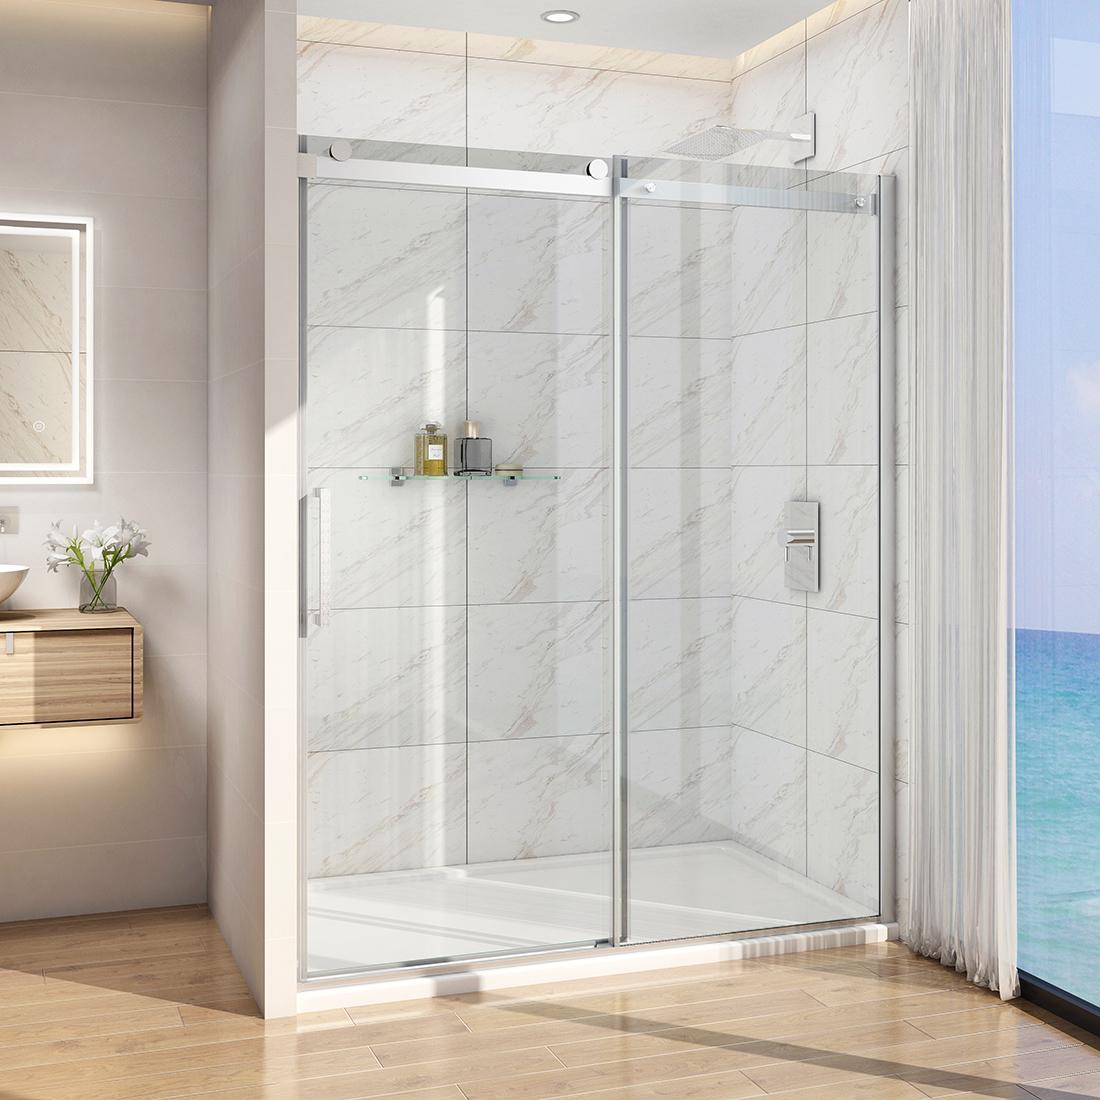 60 X36 X72 Bath Frameless Sliding Shower Door Enclosure 5